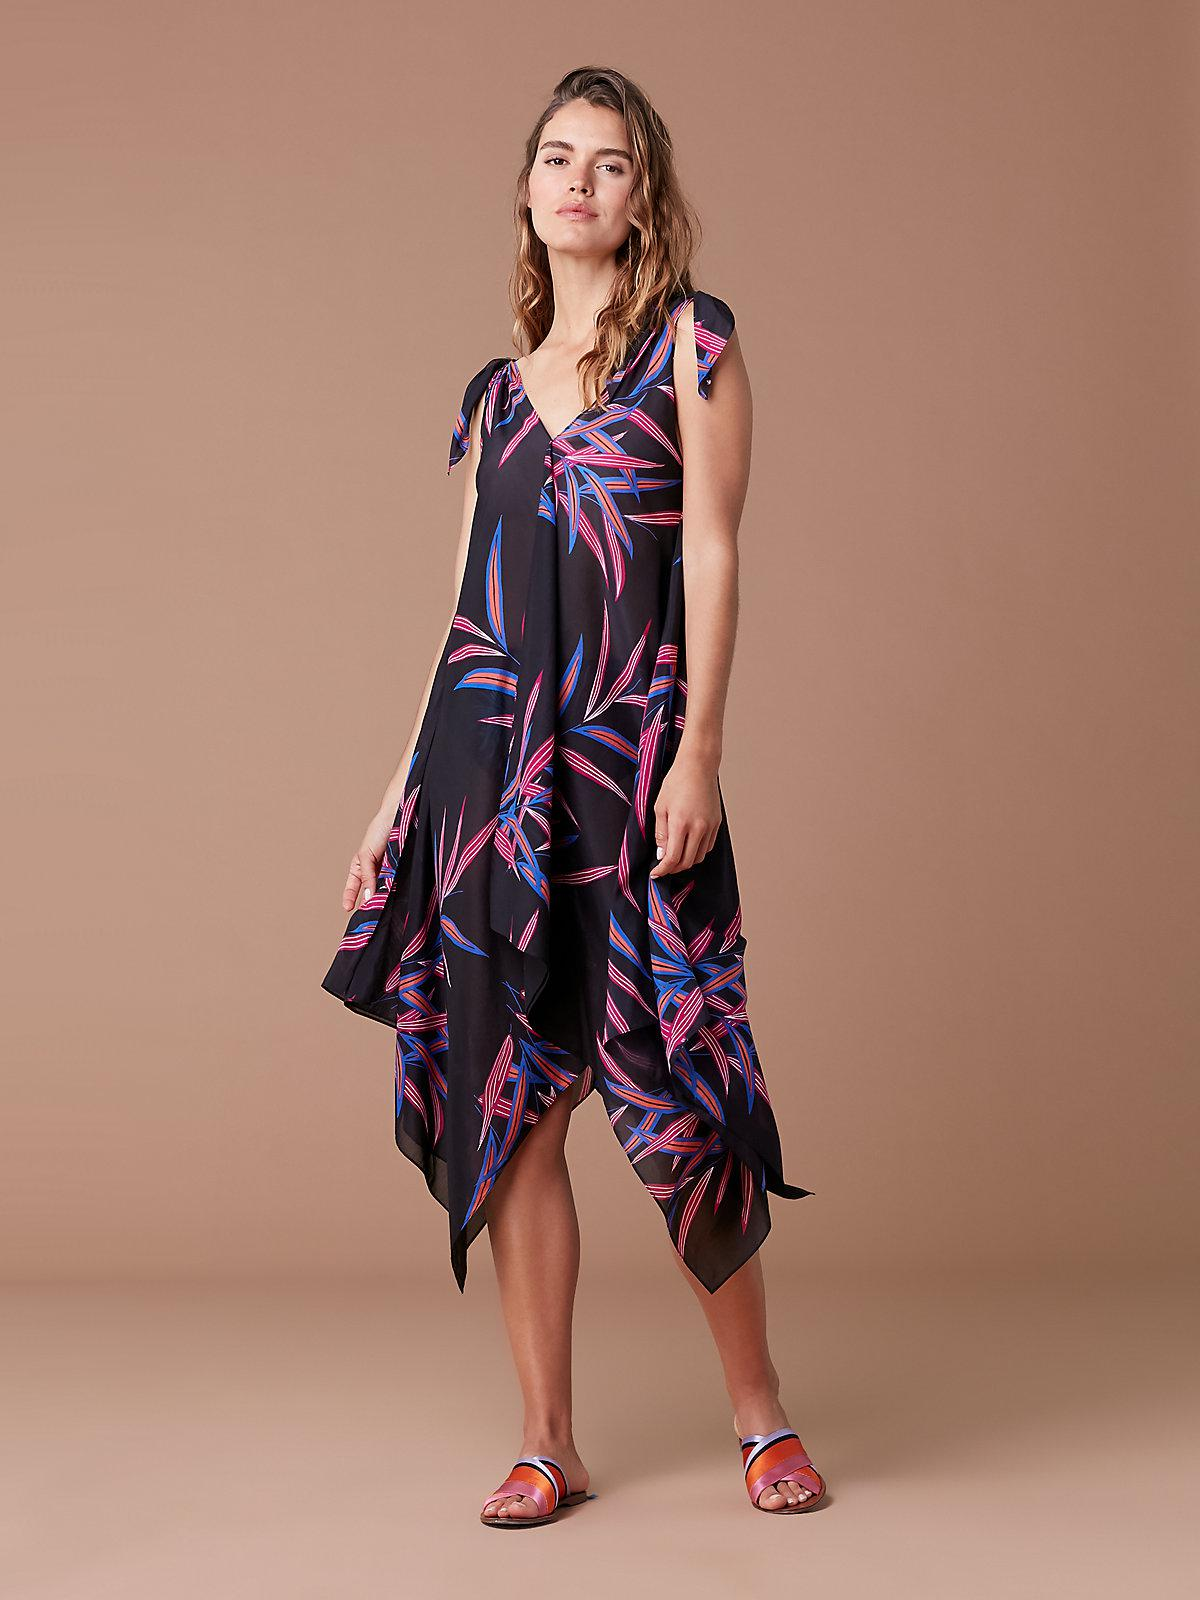 98ccce398be37 Diane von Furstenberg Sleeveless Ruffle Voile Maxi Dress in Green - Lyst